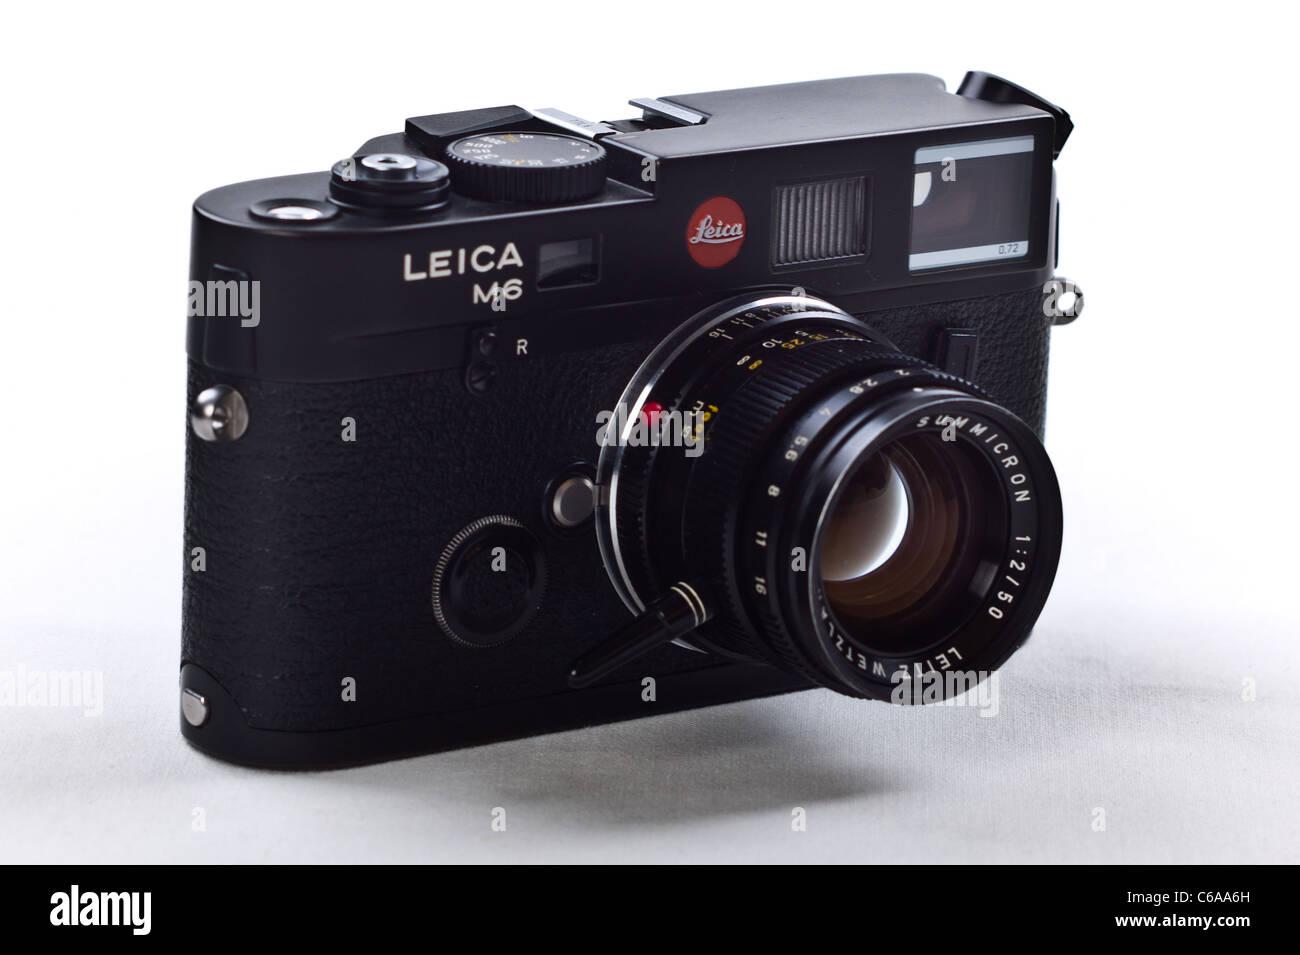 Entfernungsmesser Zeiss Oder Leica : Leica filmkamera stockfotos bilder alamy